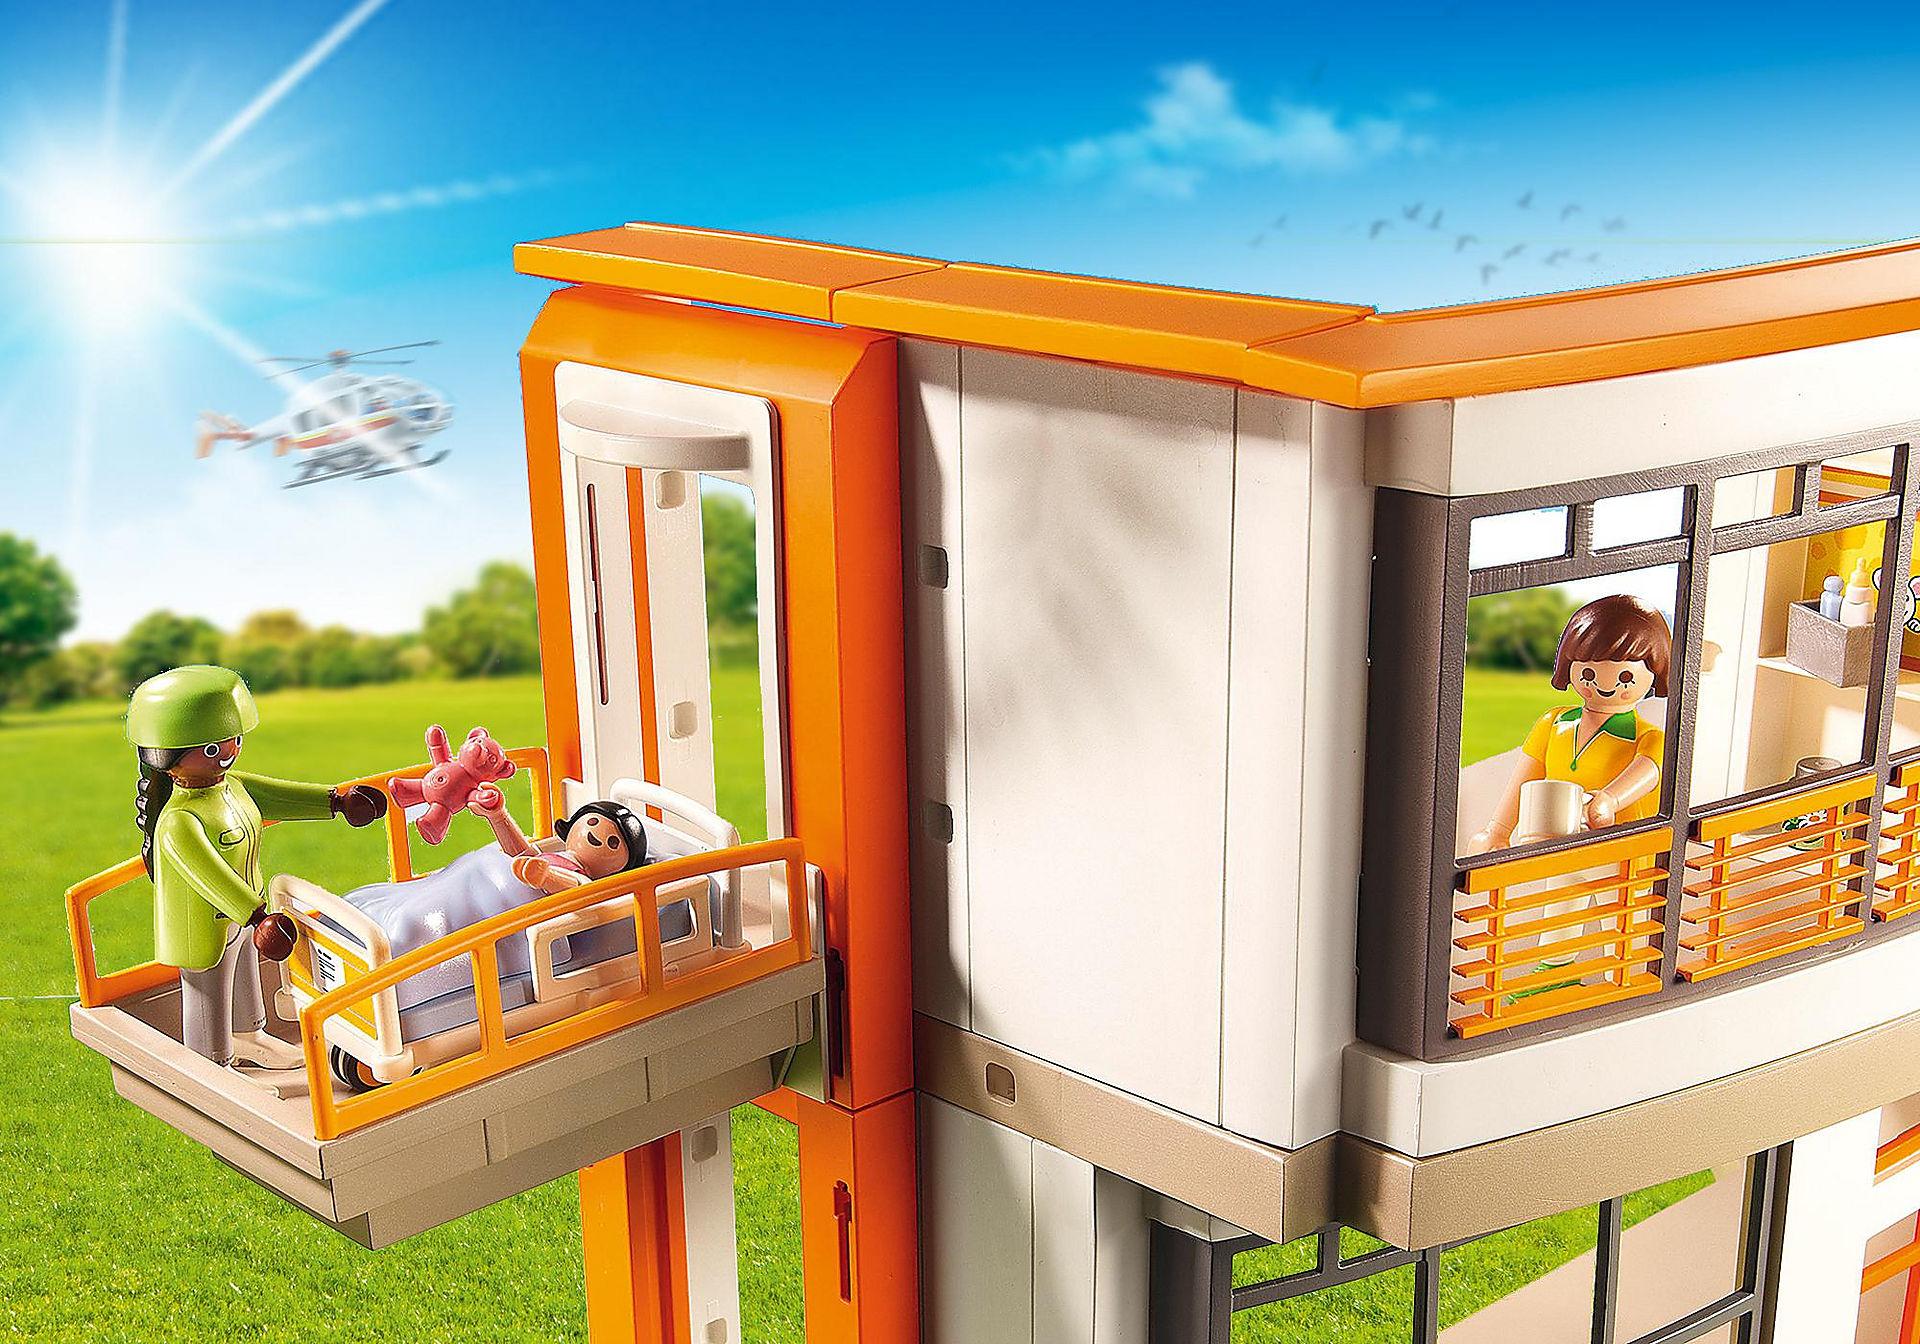 http://media.playmobil.com/i/playmobil/6657_product_extra4/Compleet ingericht kinderziekenhuis